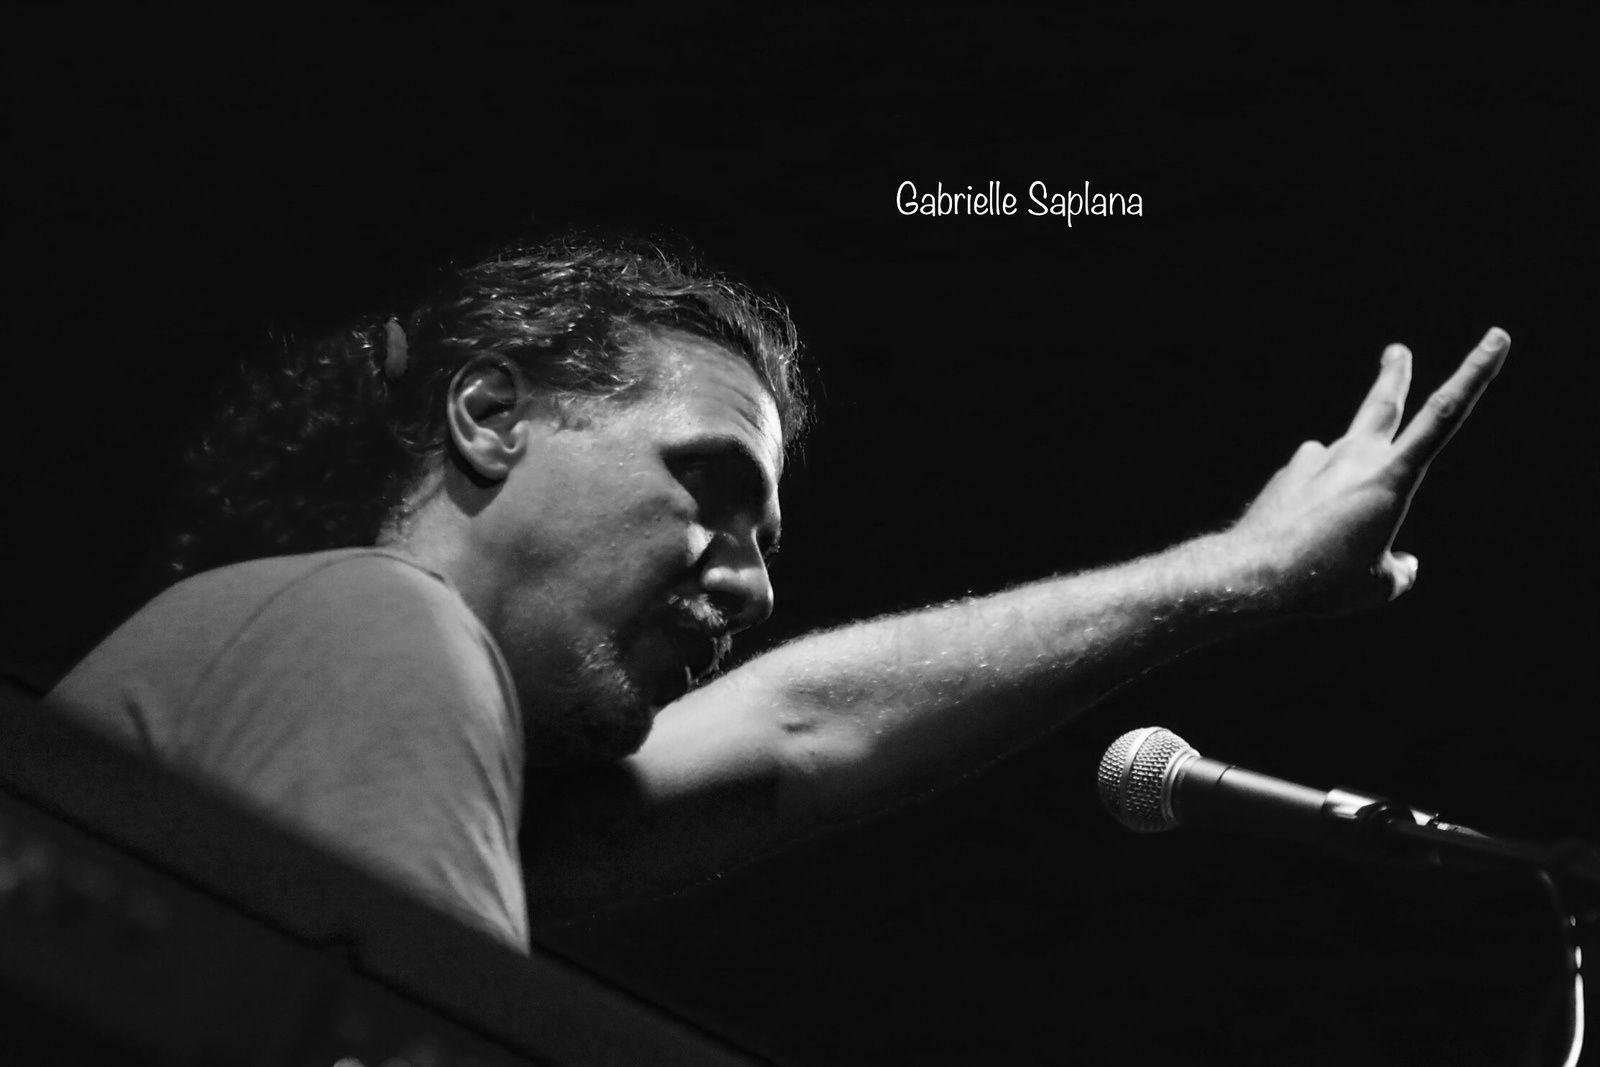 Roberto Carcasses/Bobby Carcasses/interactivo, Cuba